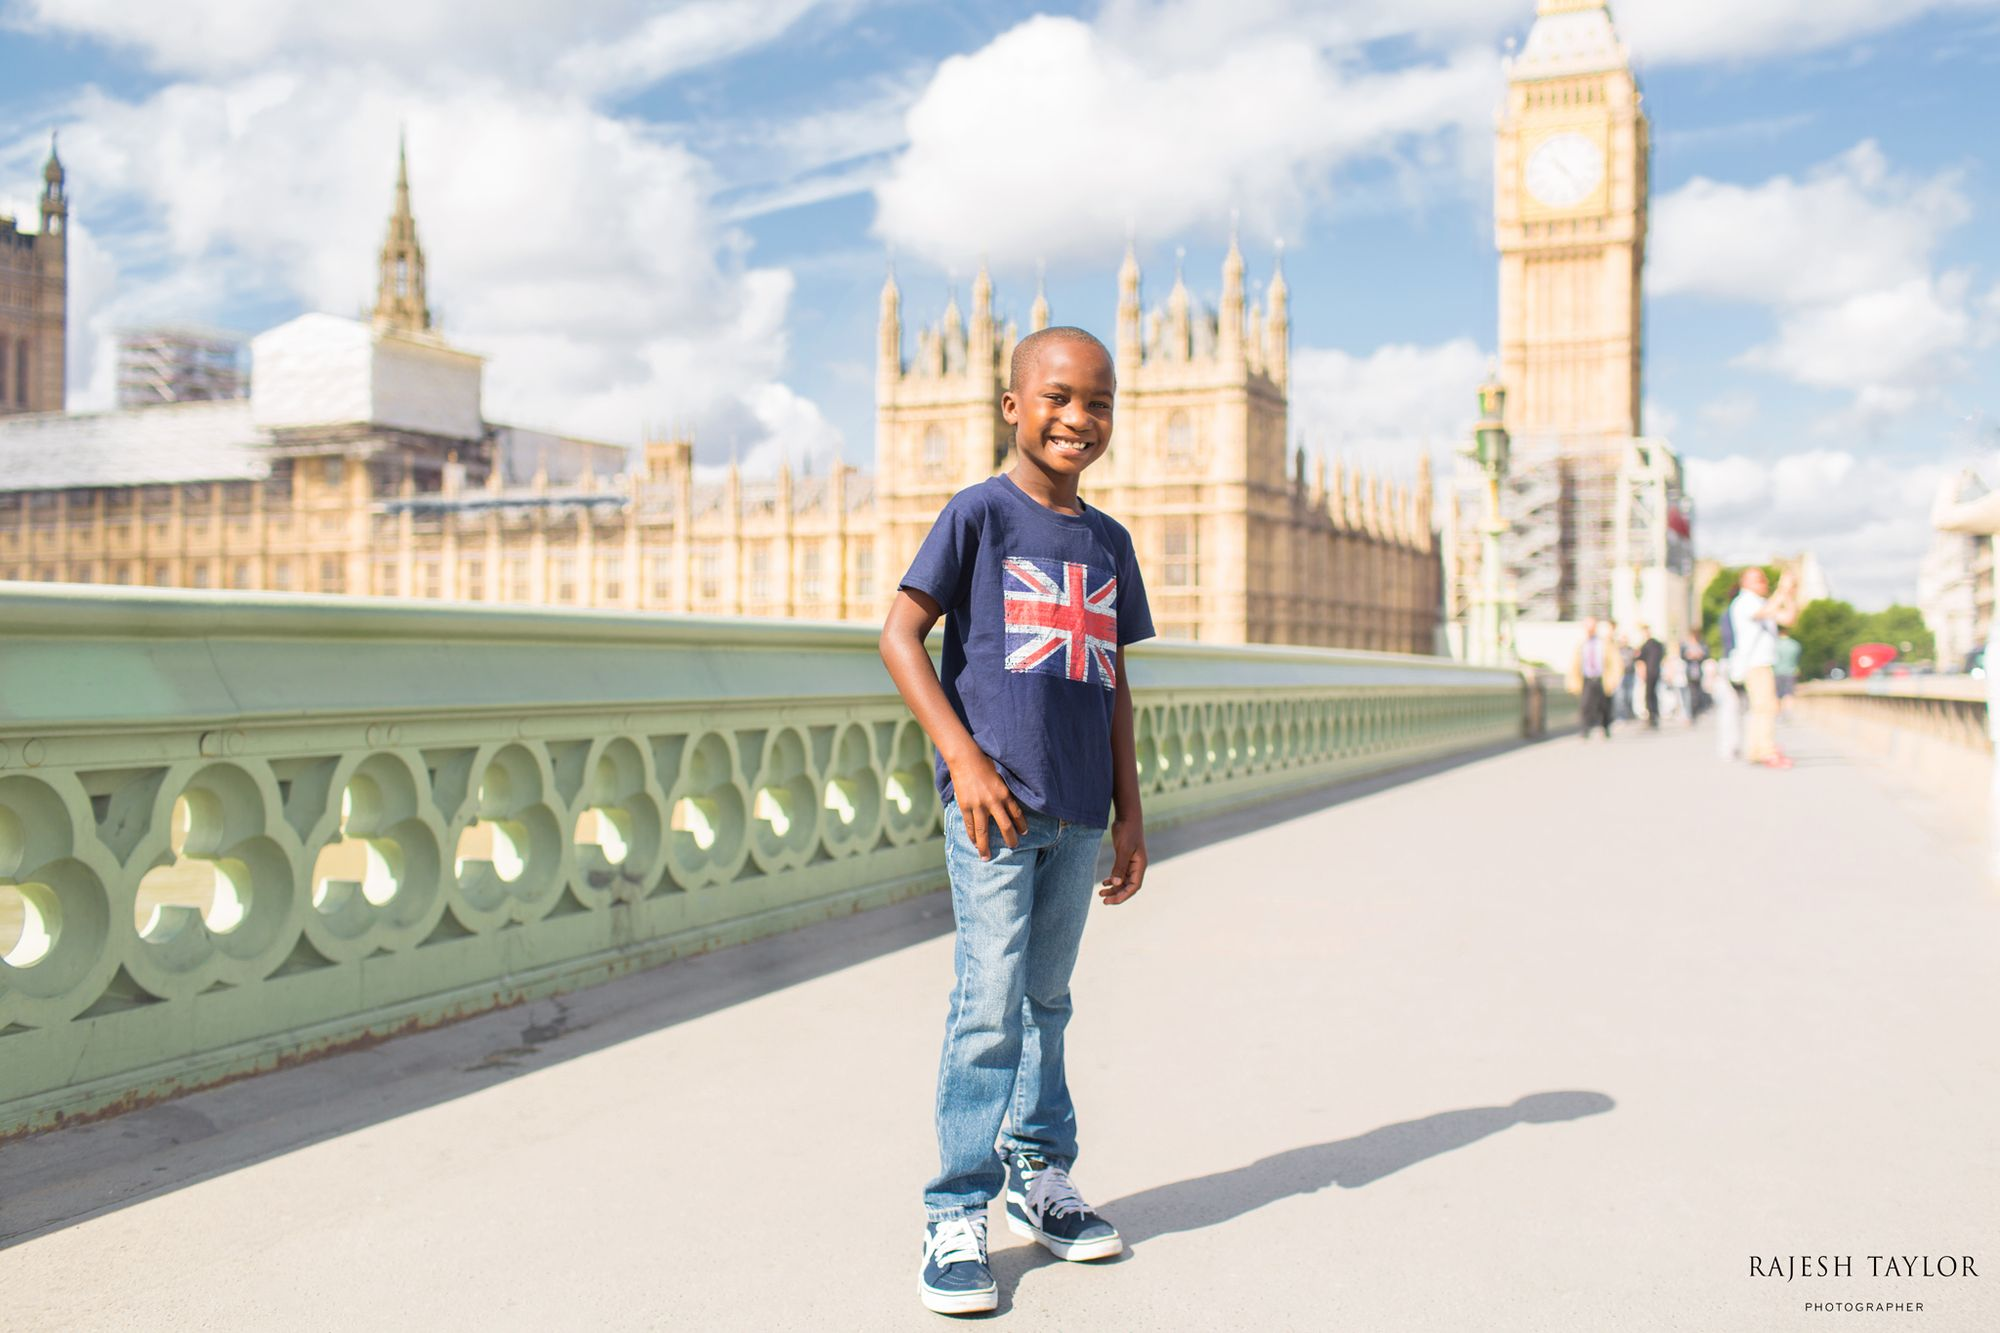 Westminster Bridge towards Elizabeth Tower & Houses of Parliament © Rajesh Taylor